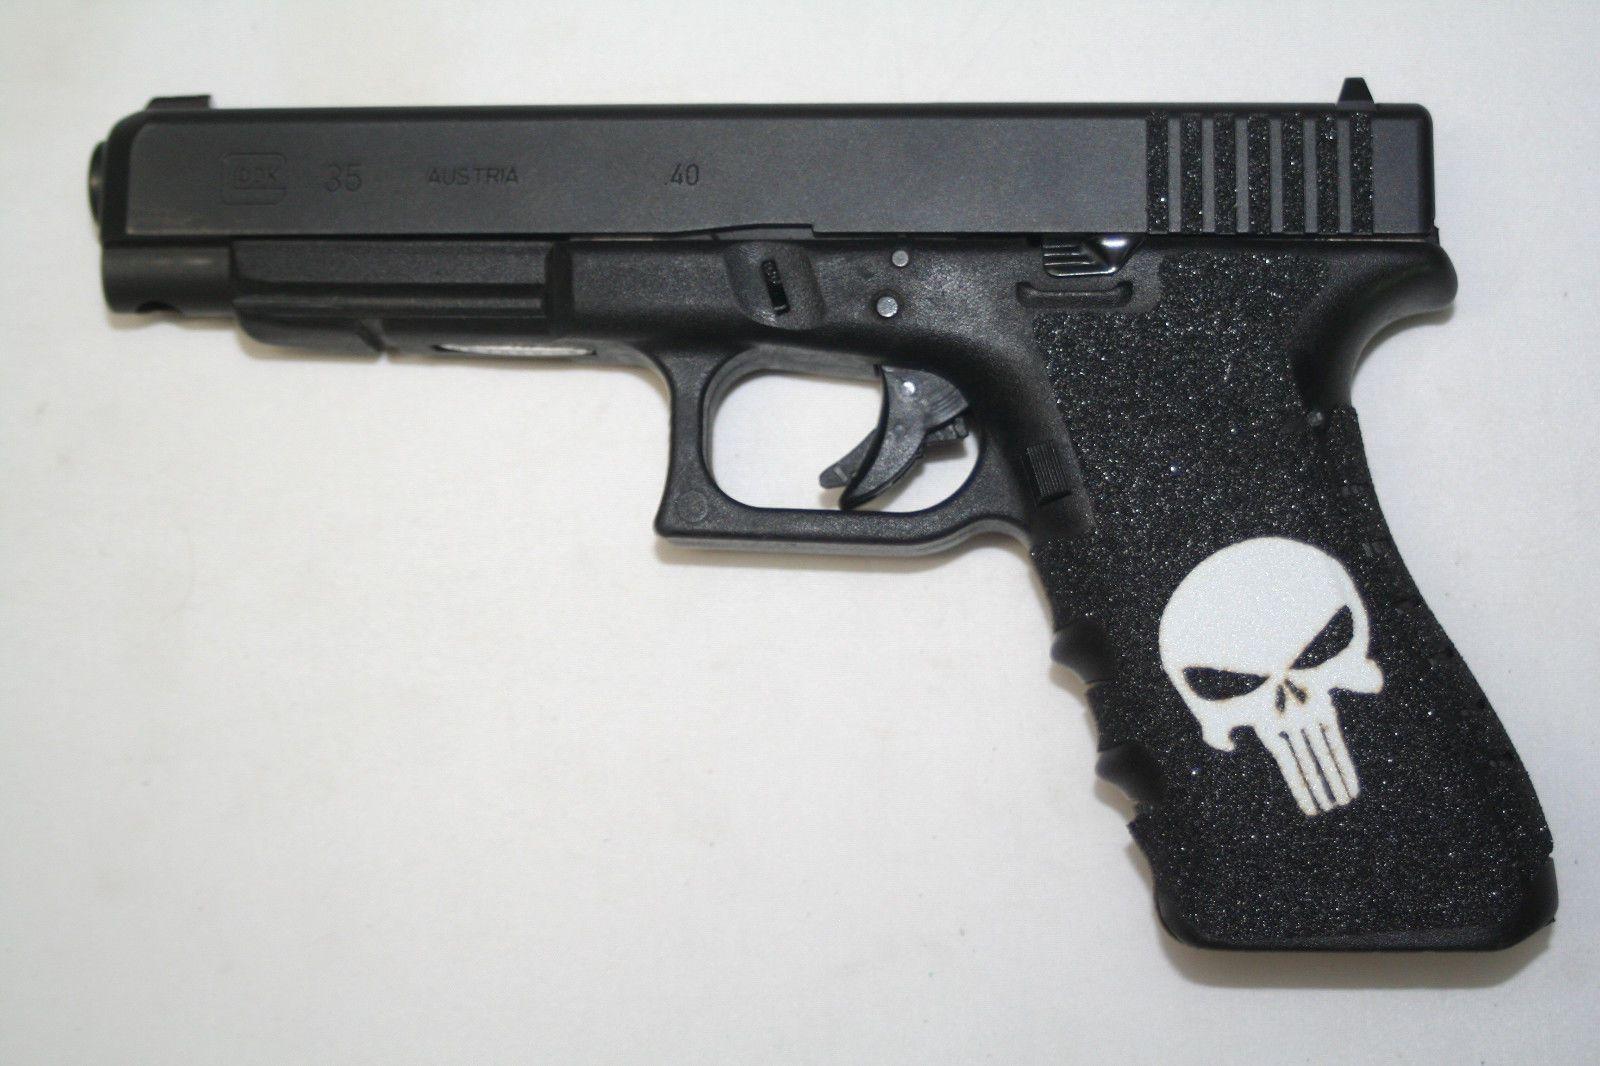 Punisher inlay gun grip tape pistol fits 19 23 25 32 38 handgun punisher inlay gun grip tape pistol fits 19 23 25 32 38 handgun non slip publicscrutiny Gallery